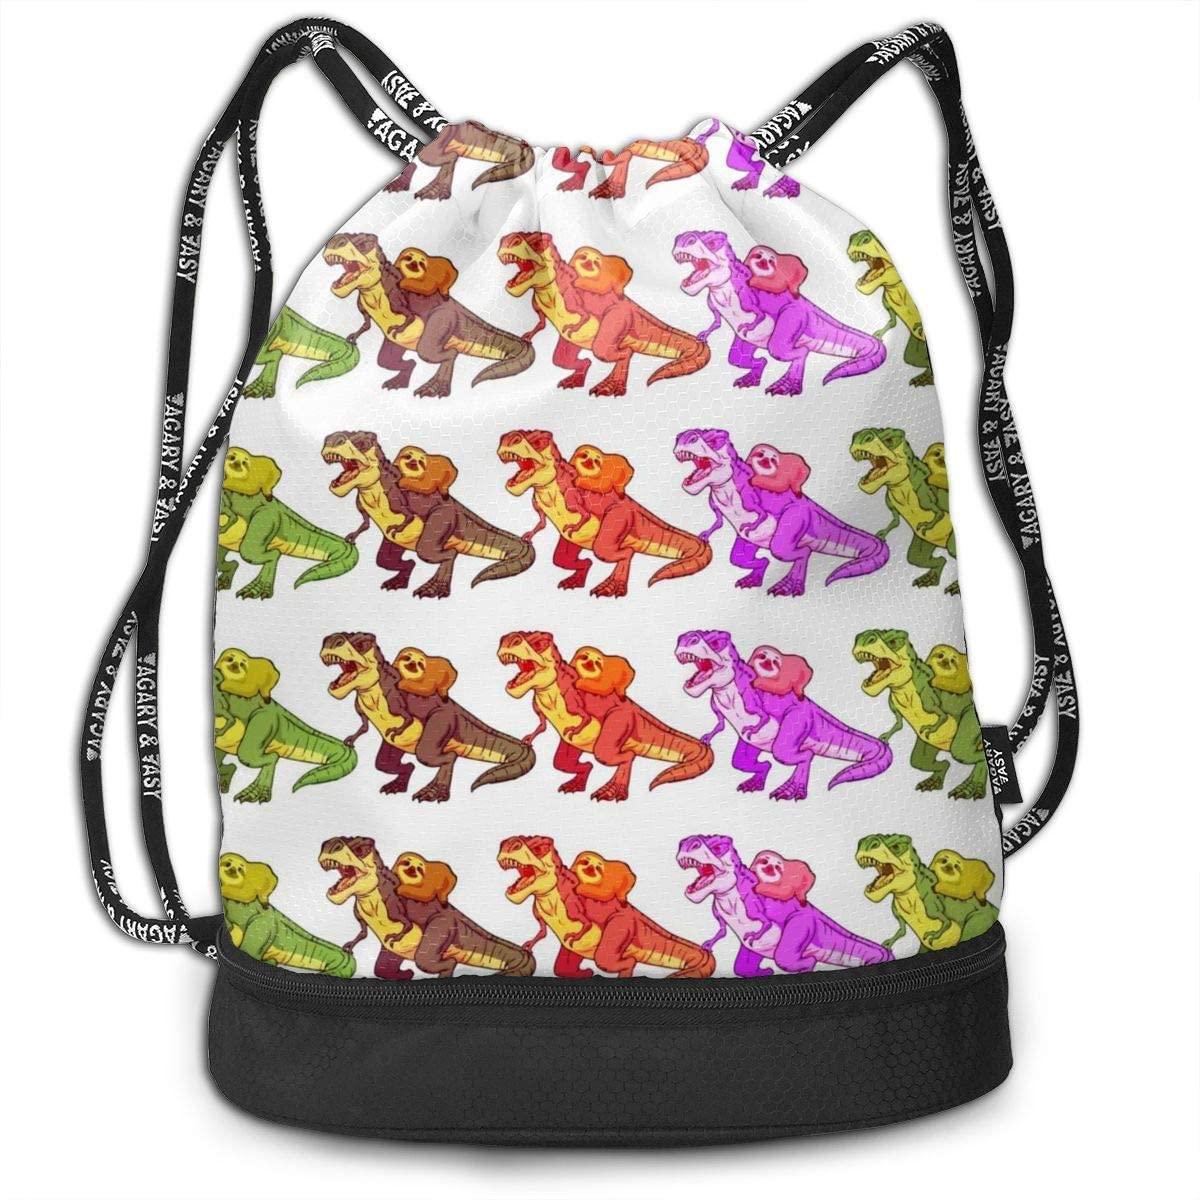 NiYoung Gym Drawstring Sports Bag Simple Quick Dry Bundle Backpack, Sloth Riding Dinosaur